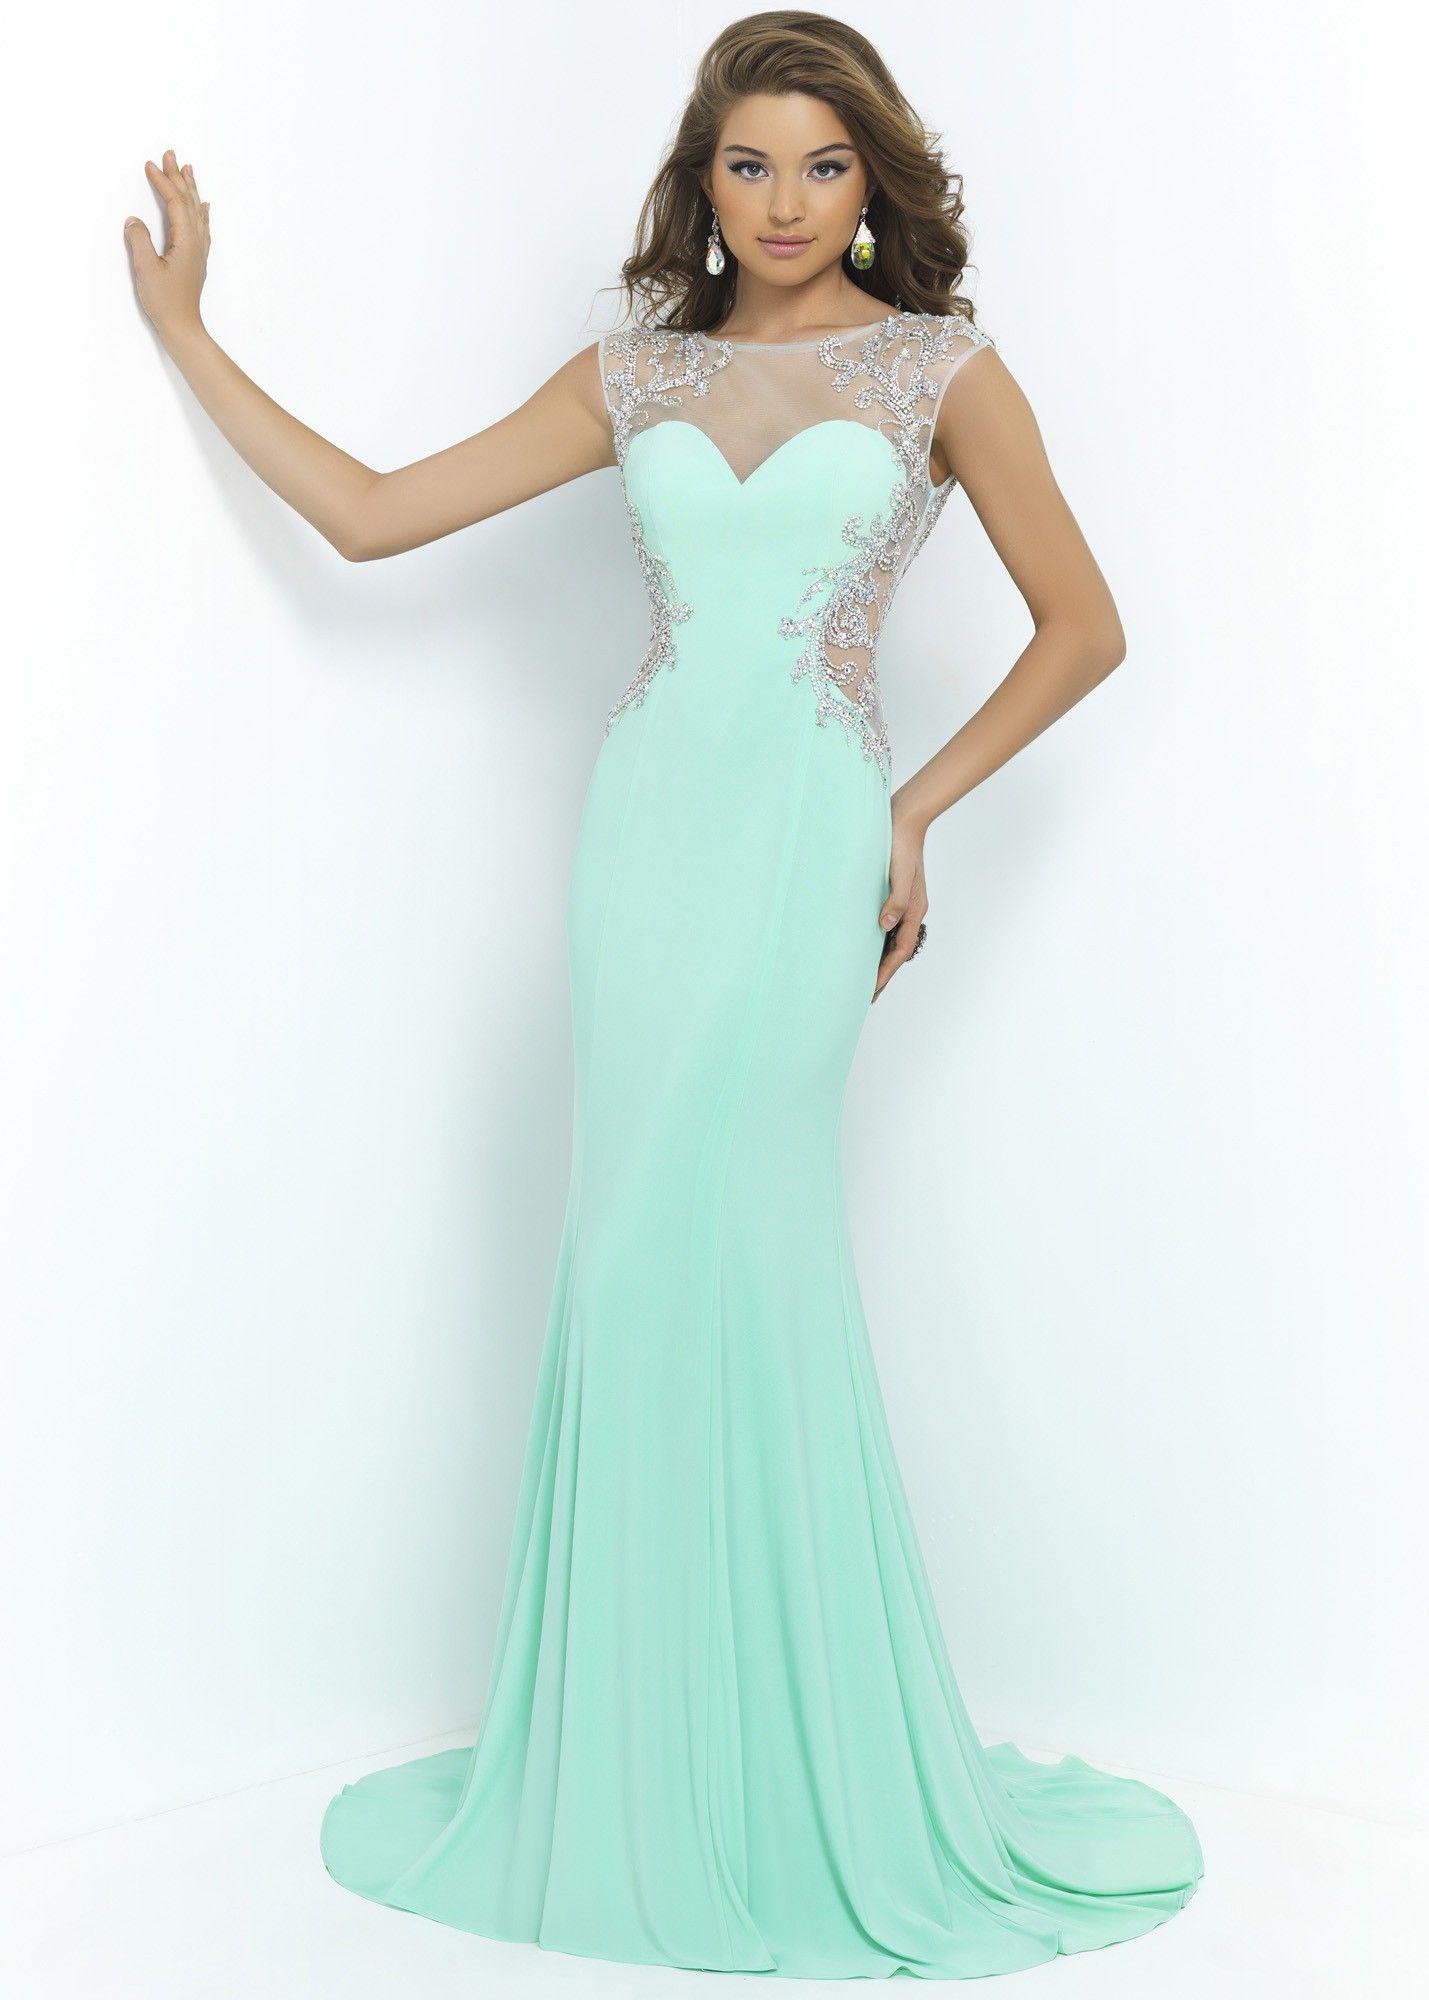 Blush 9942 Sexy Illusion Dress SALE | Long evening dress | Pinterest ...